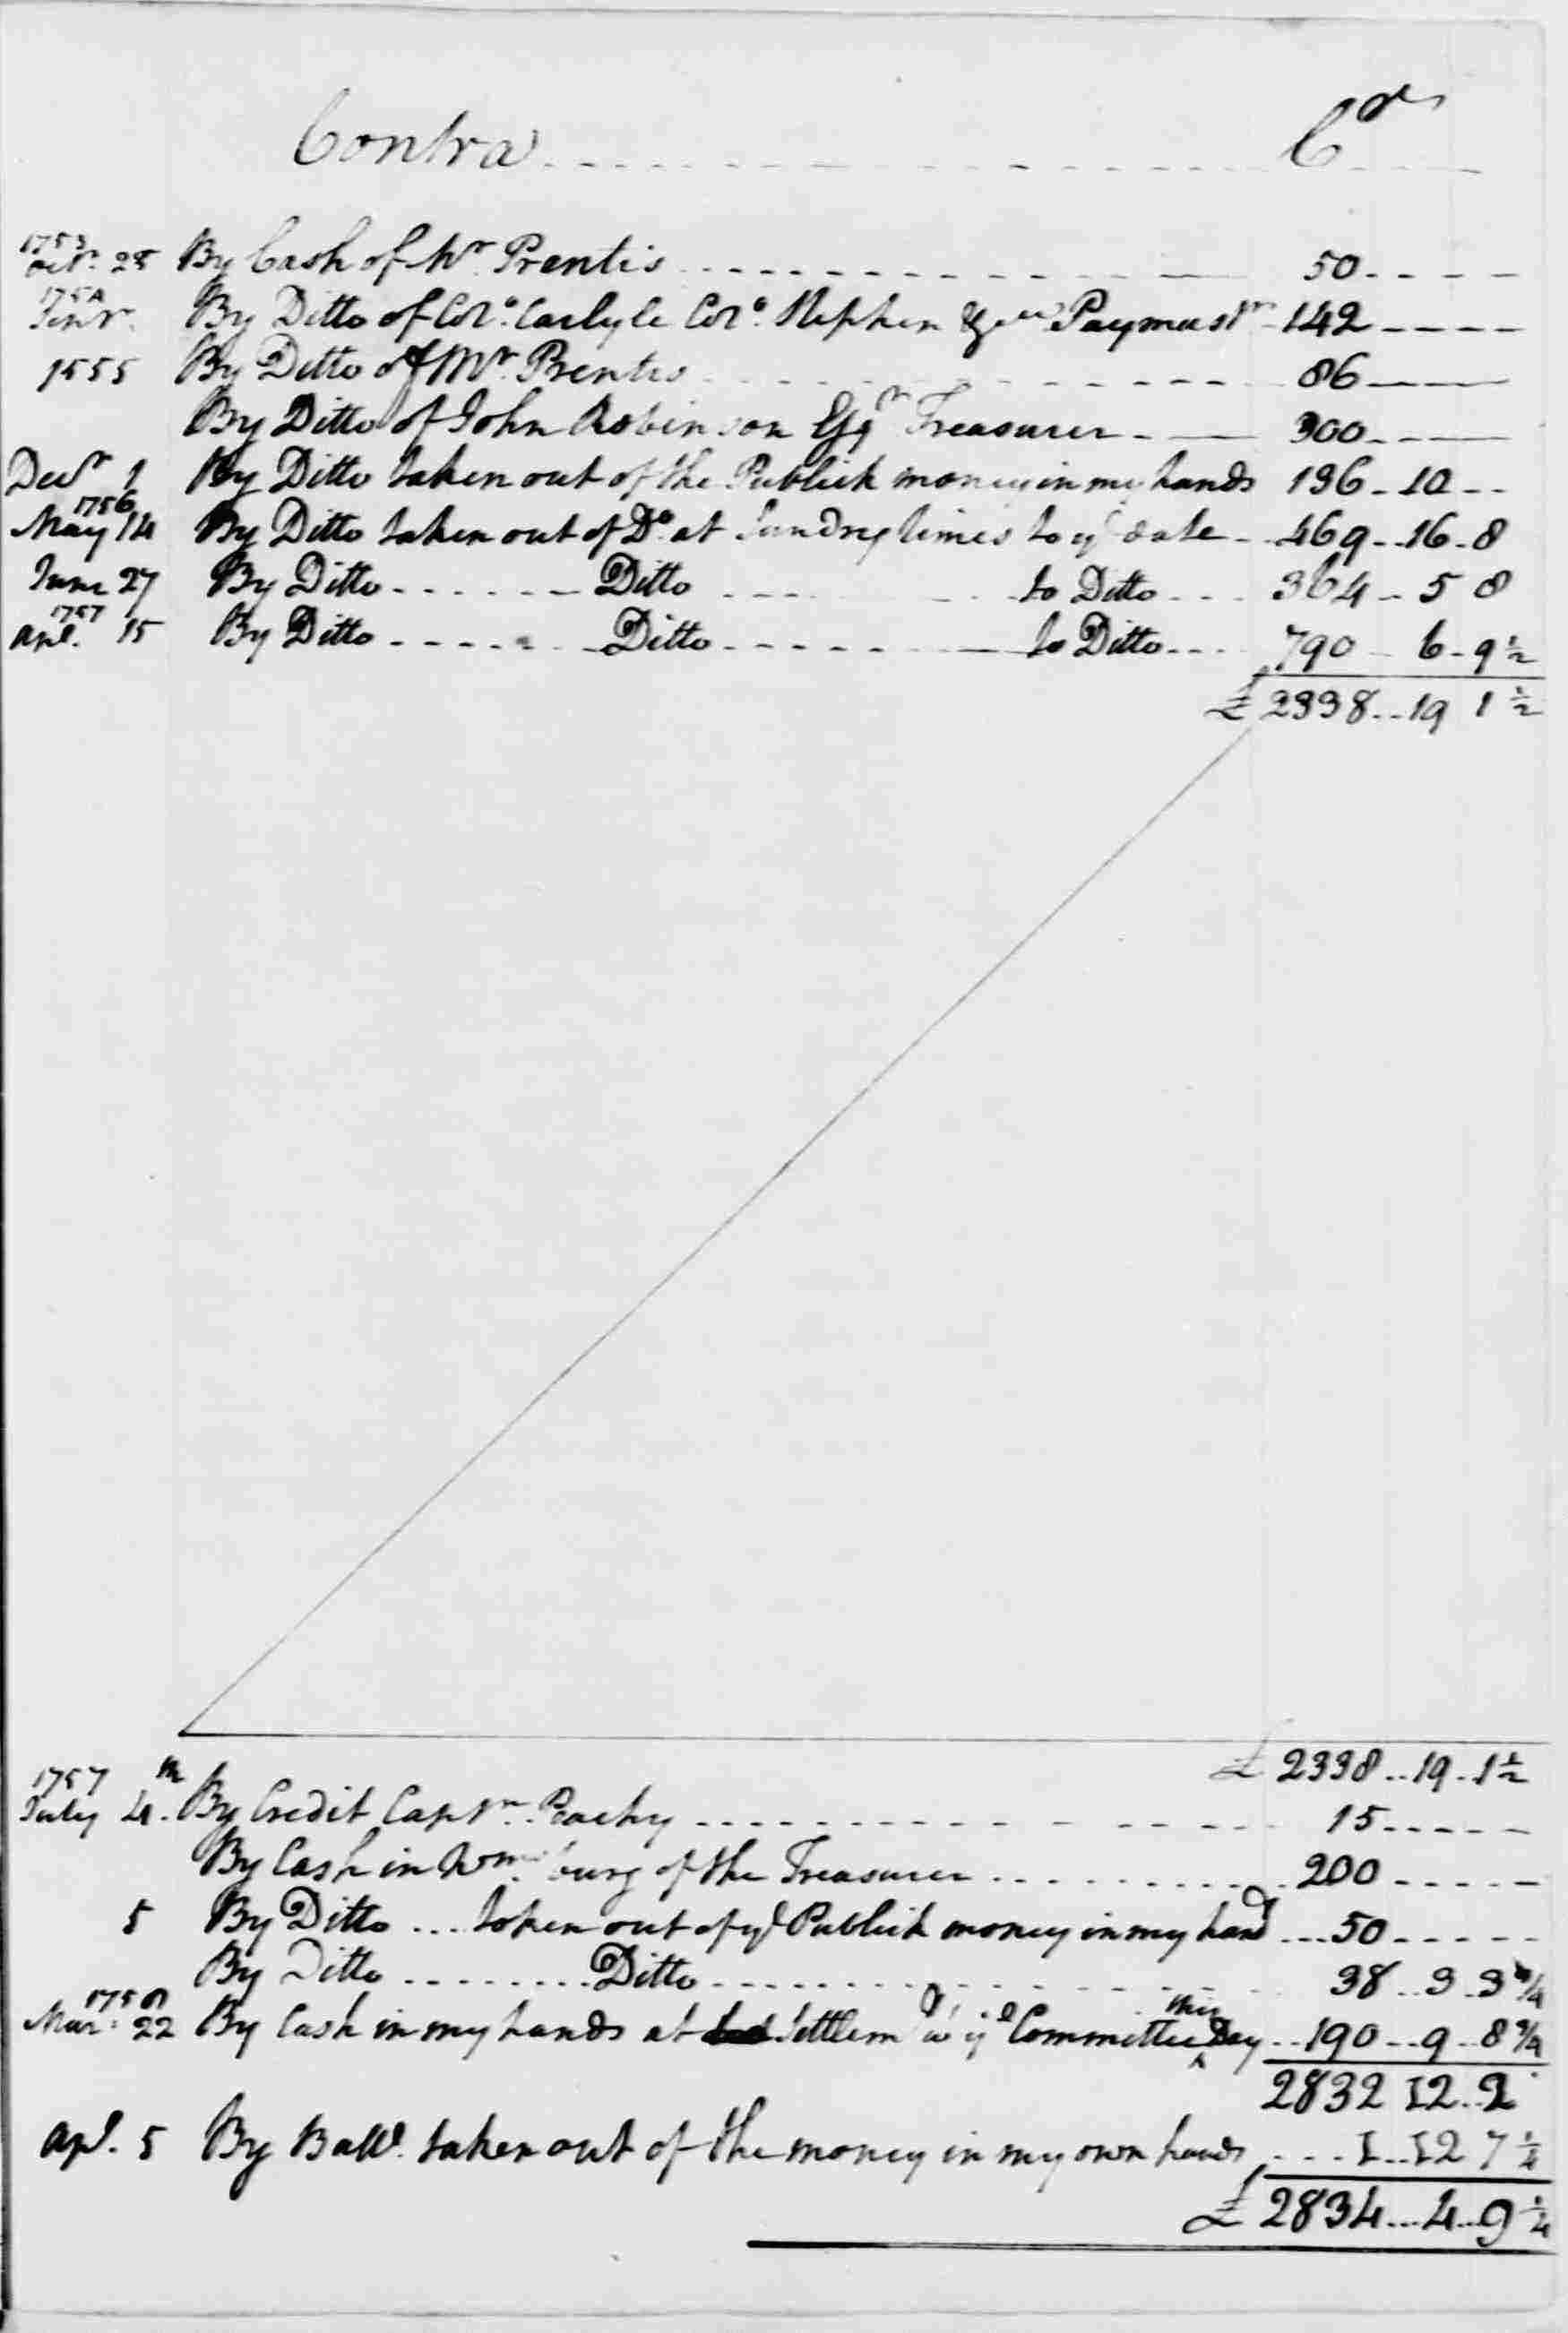 Ledger A, folio 45, right side